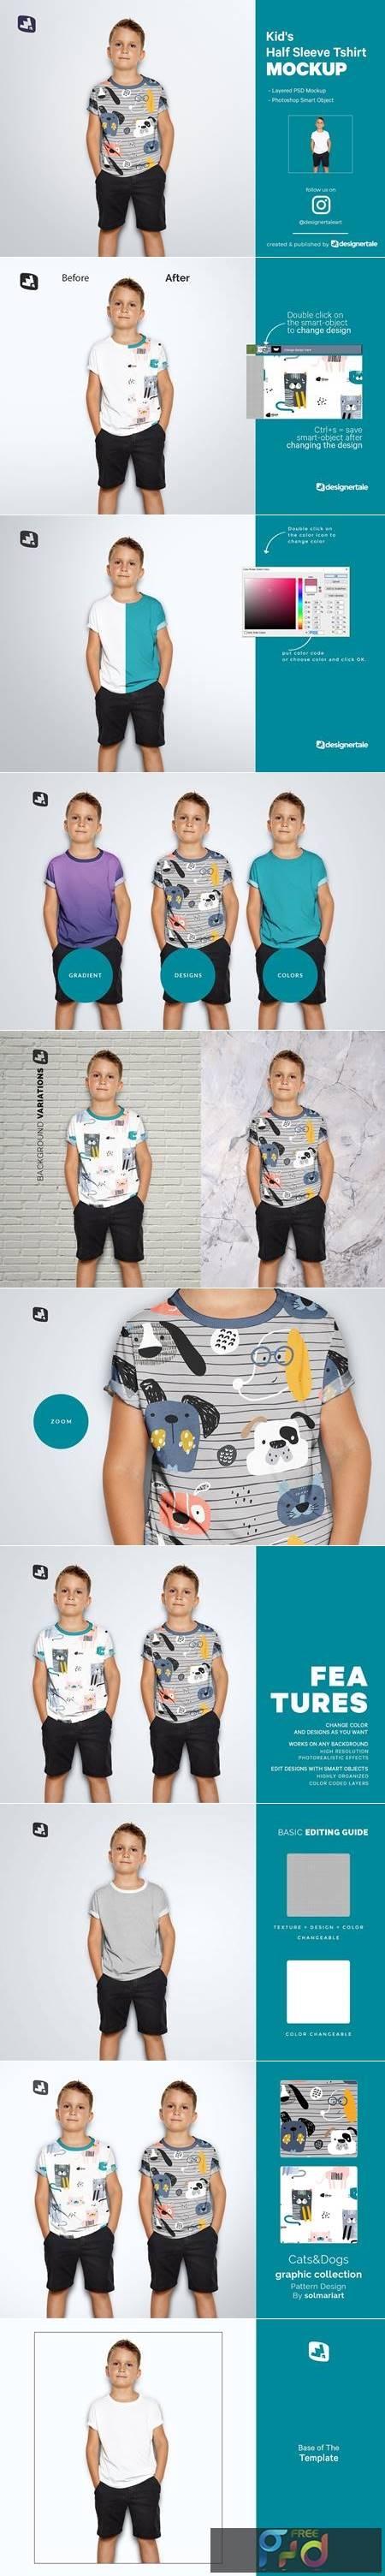 Kids Half Sleeve Tshirt Mockup 5242214 1